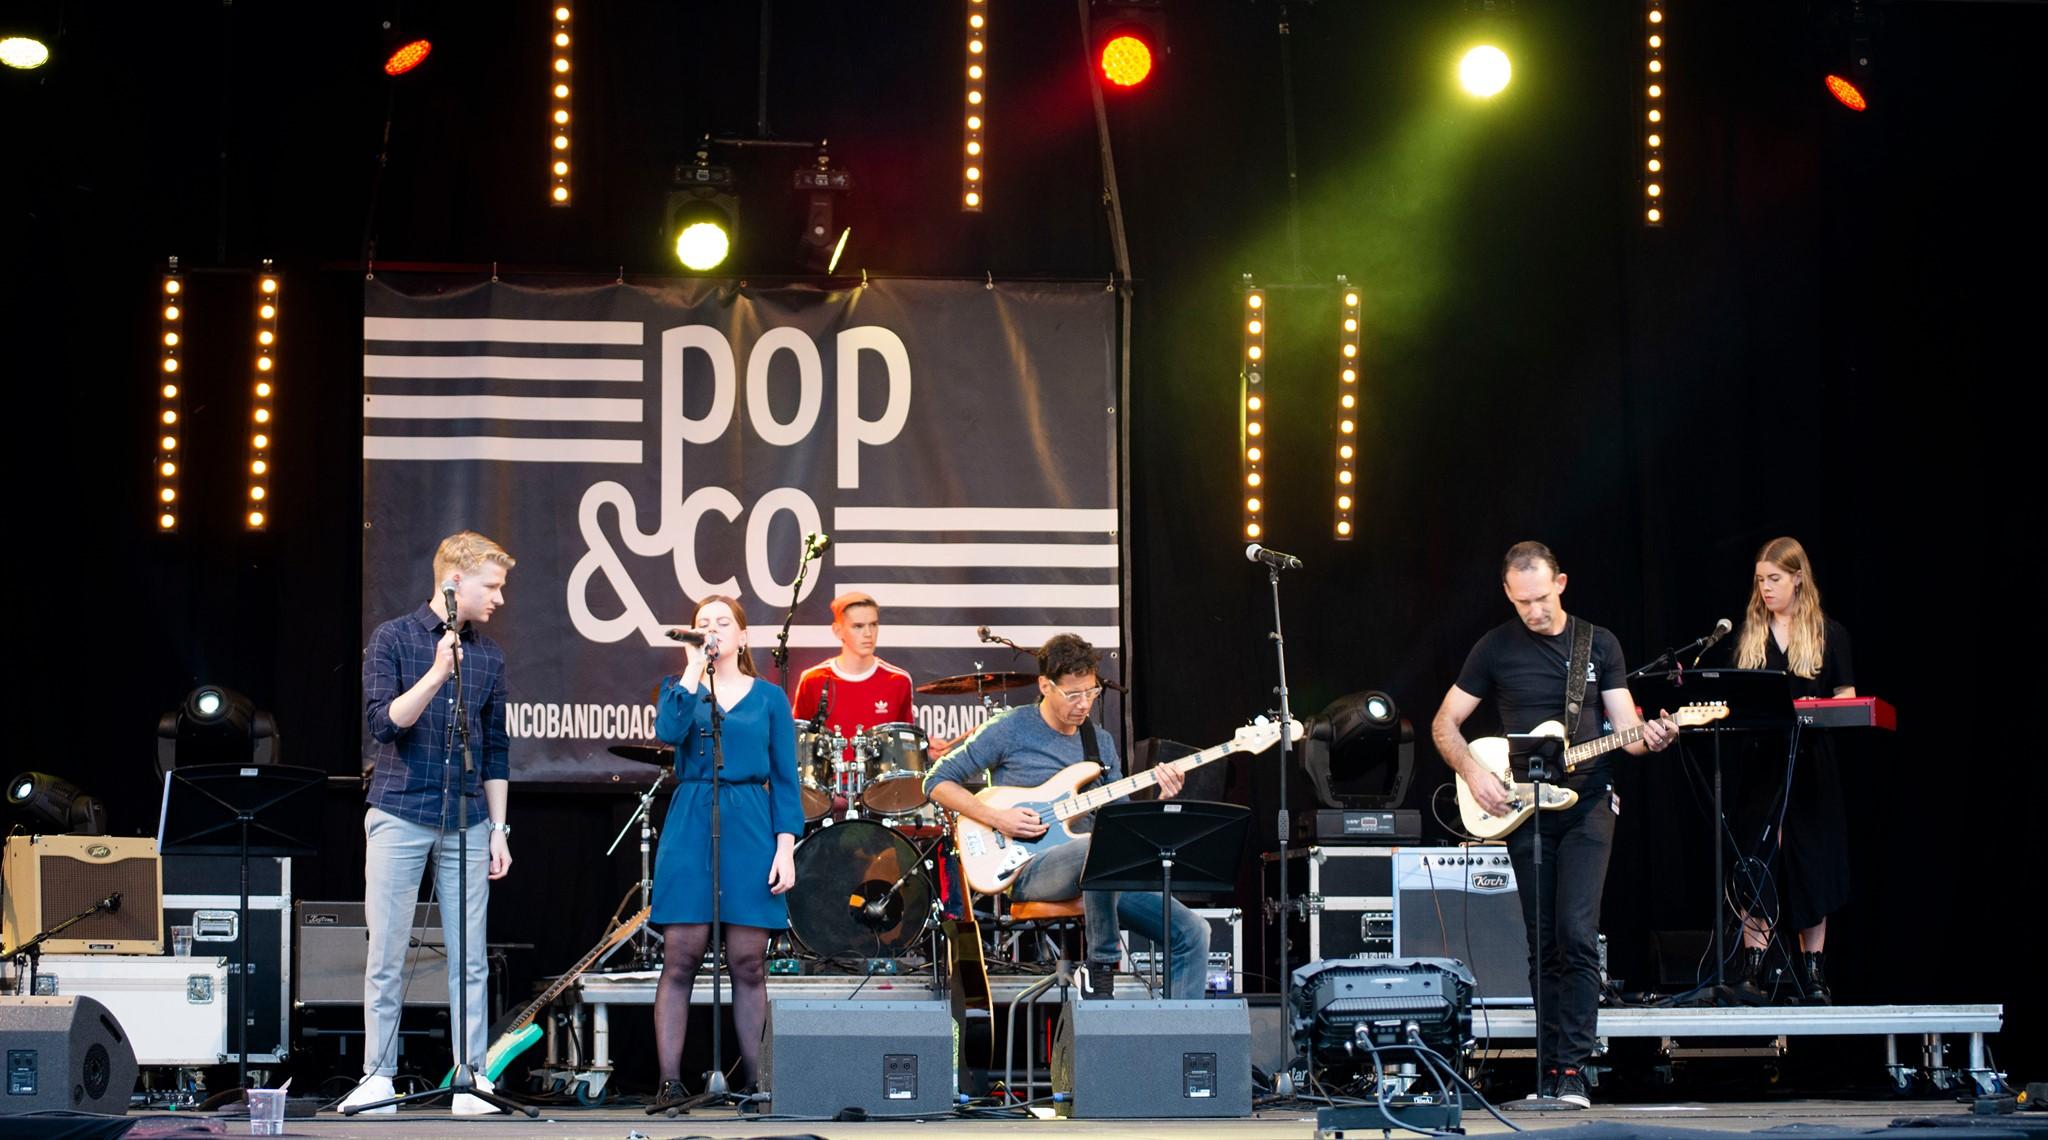 Pop & Co Live